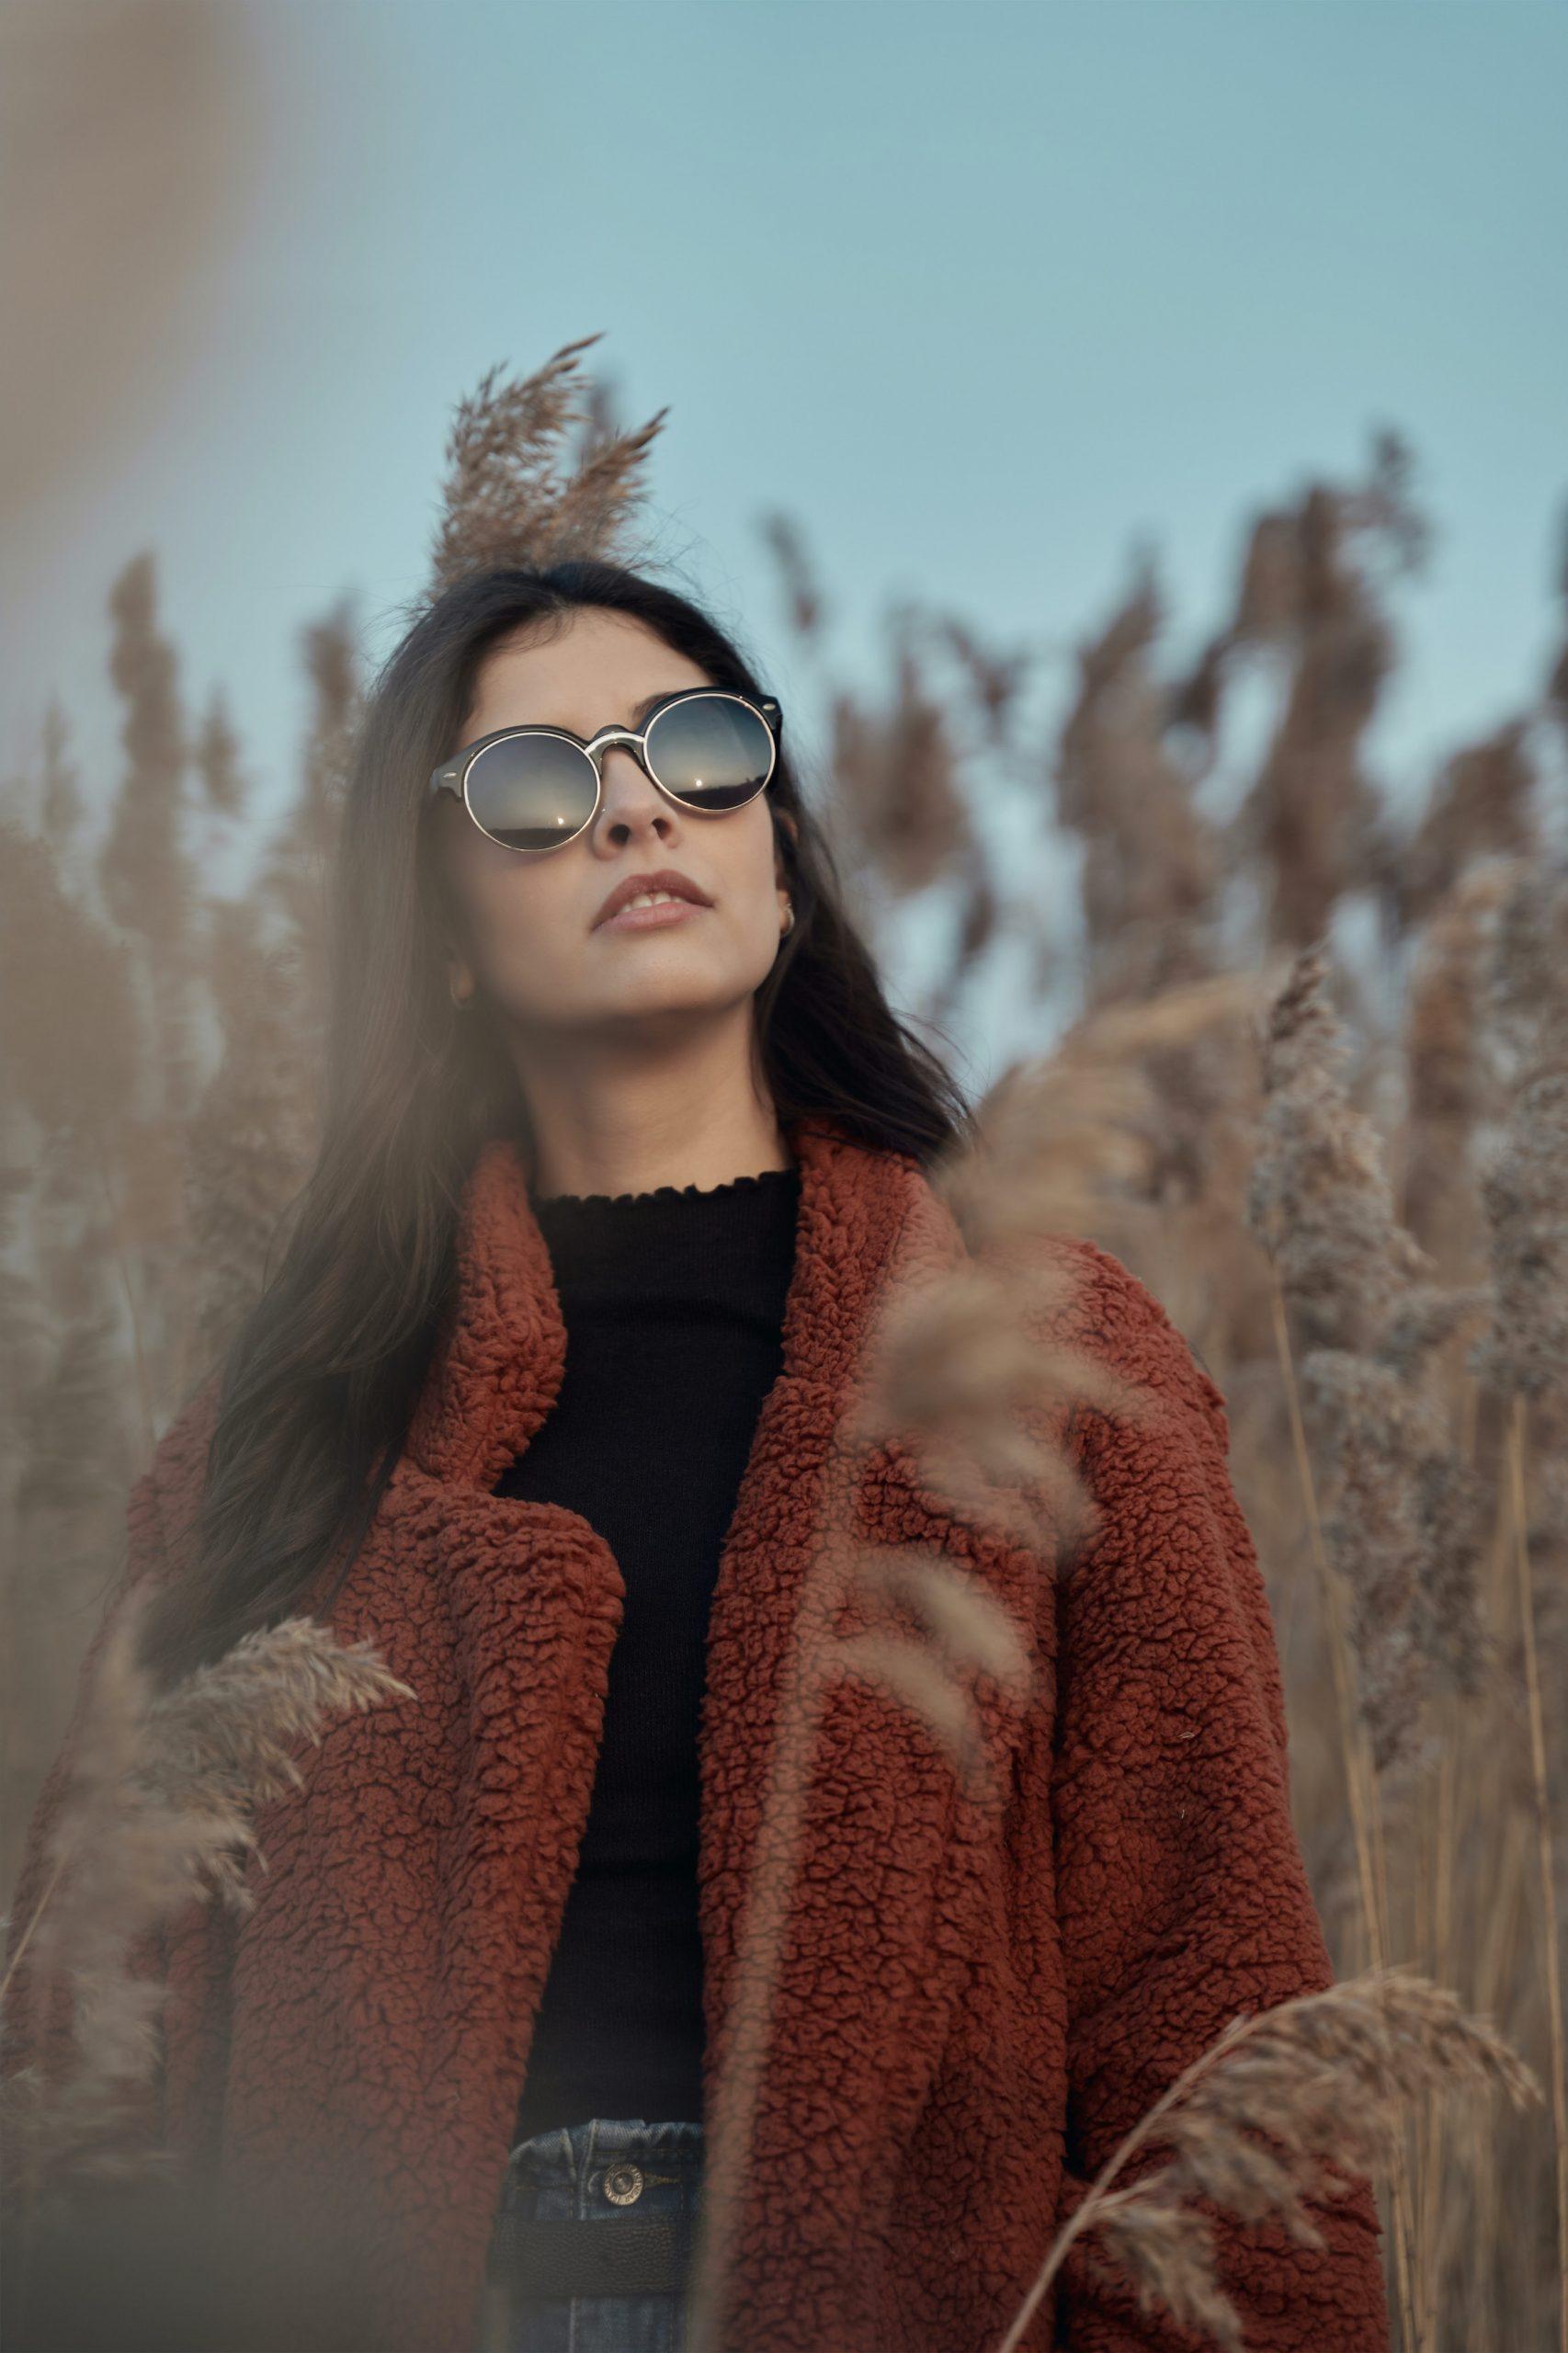 Categorie: Glamour, Portrait - Ph: MIRKO LEONI - Model: KELLY BATTIZOCCO - Location: San Bonifacio, VR, Italia